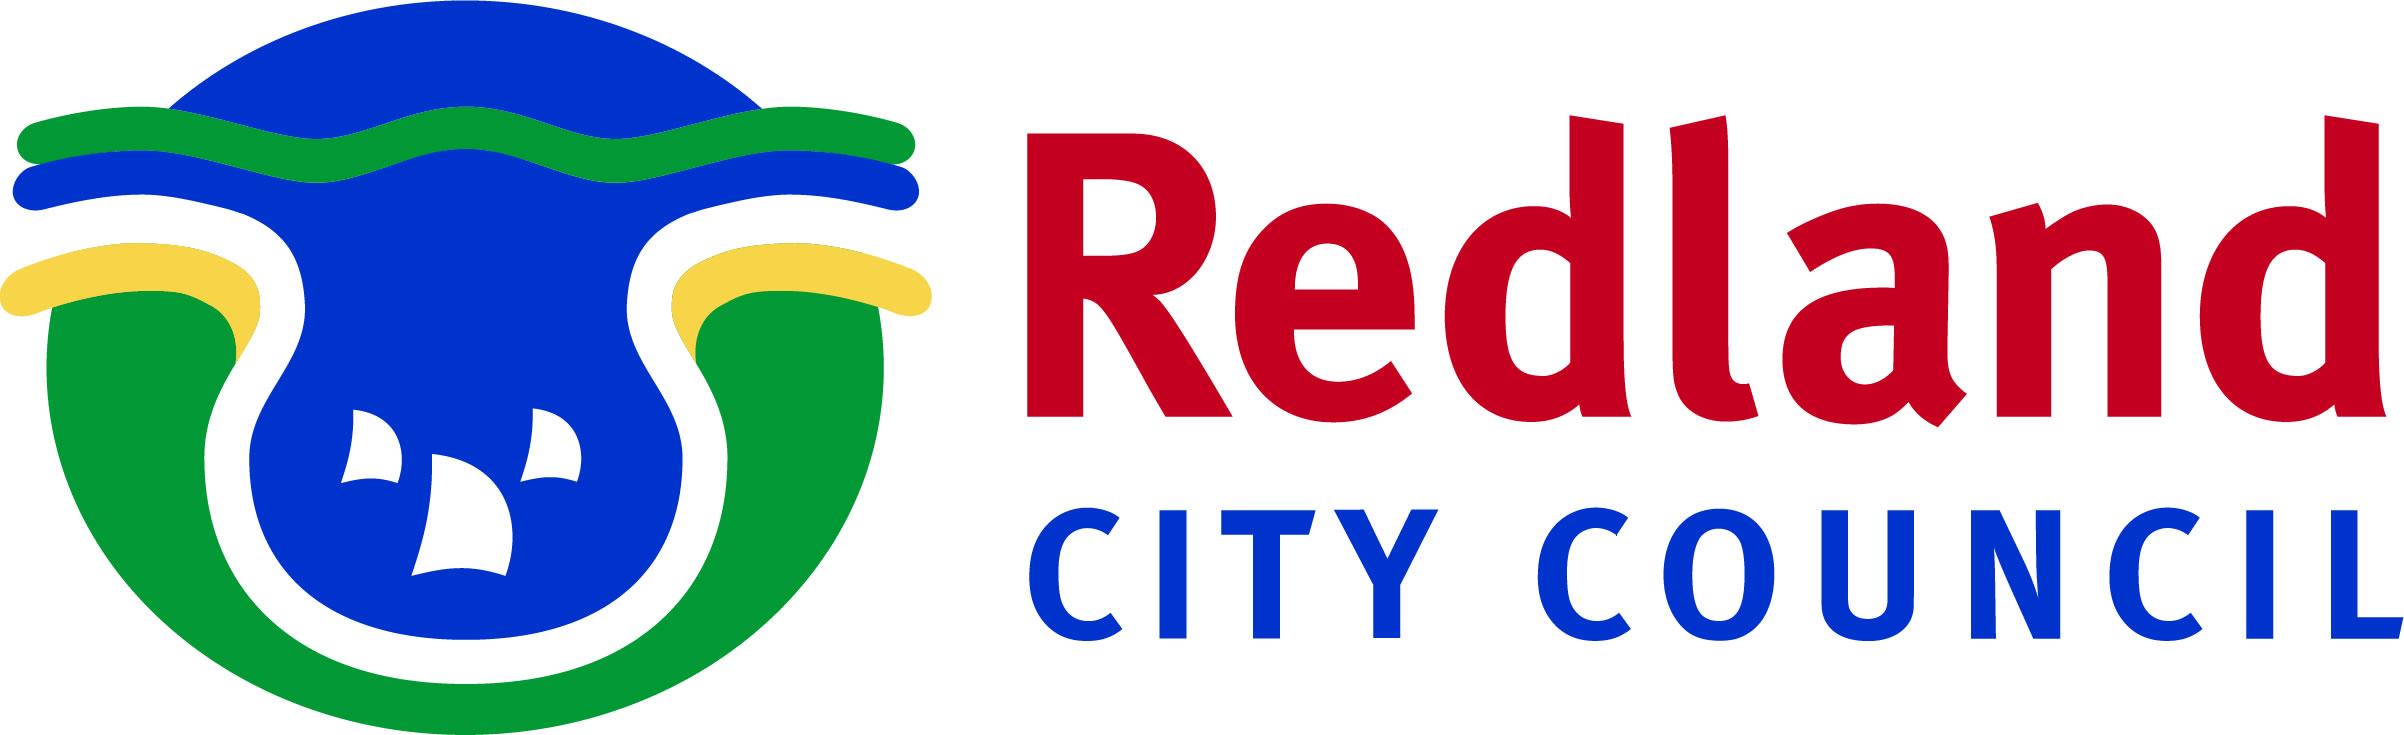 RCC-Logo-H-RGB-Websafe-A333532.jpg